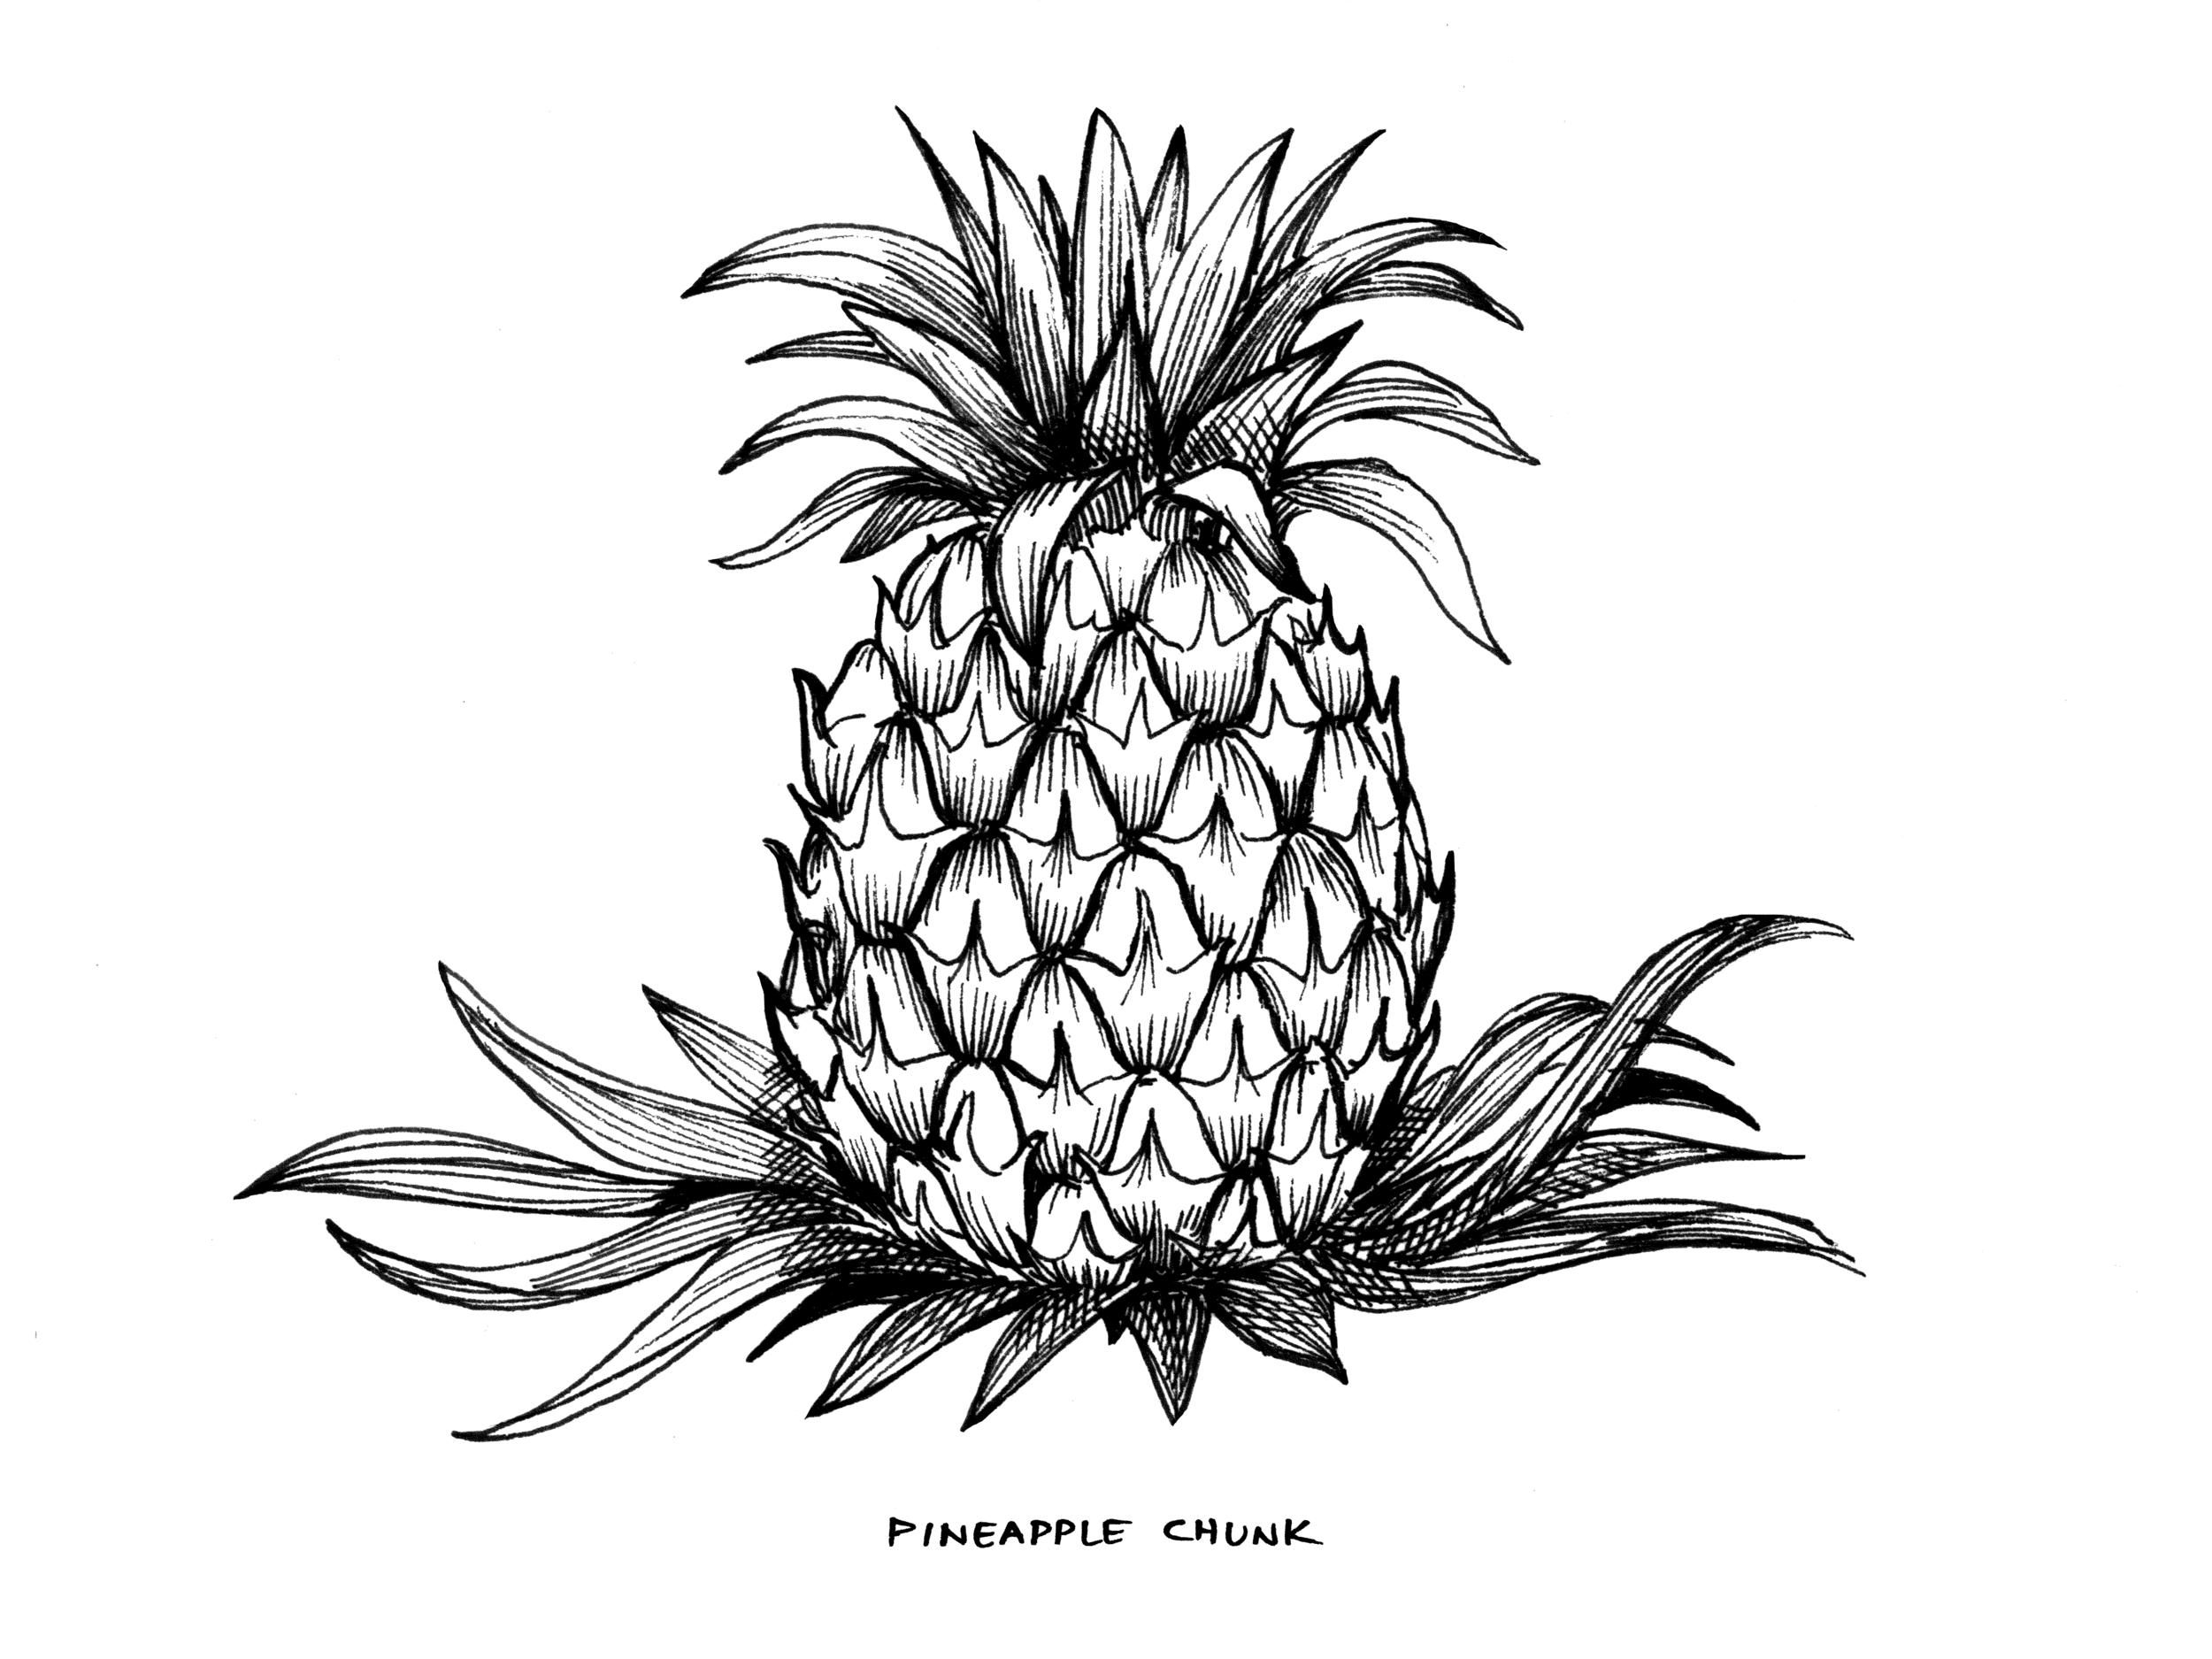 PineappleChunk_StrainArt.png